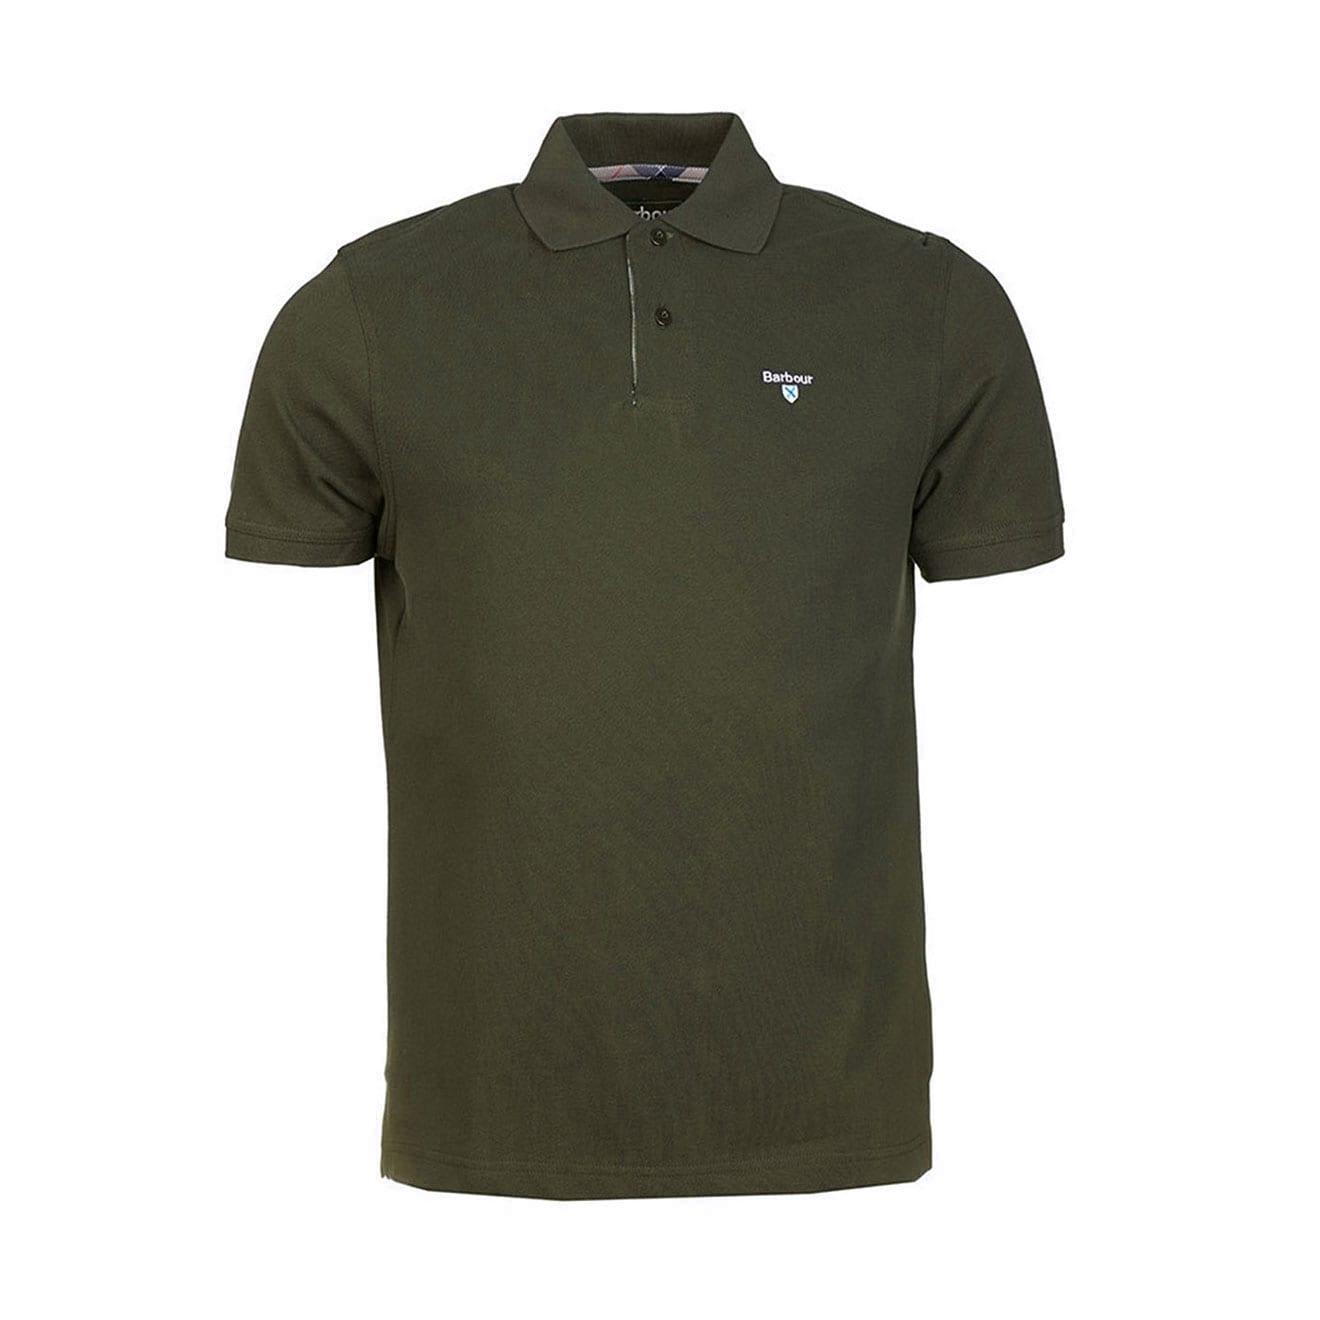 Barbour Tartan Cotton Pique Polo Shirt Forest Green The